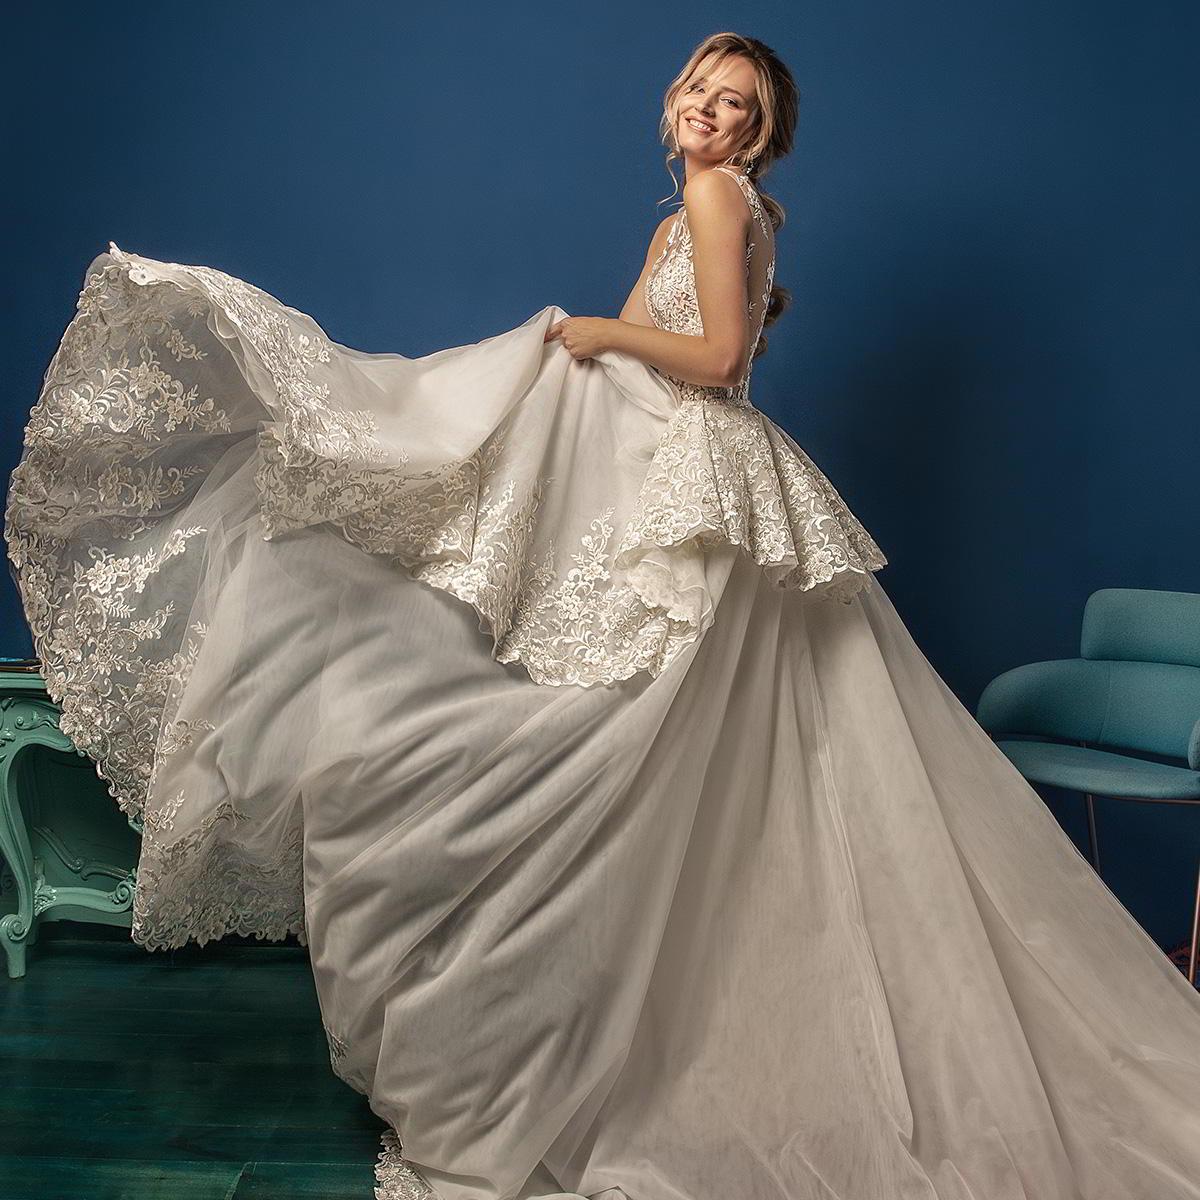 Amelia Sposa 2019 Wedding Dresses